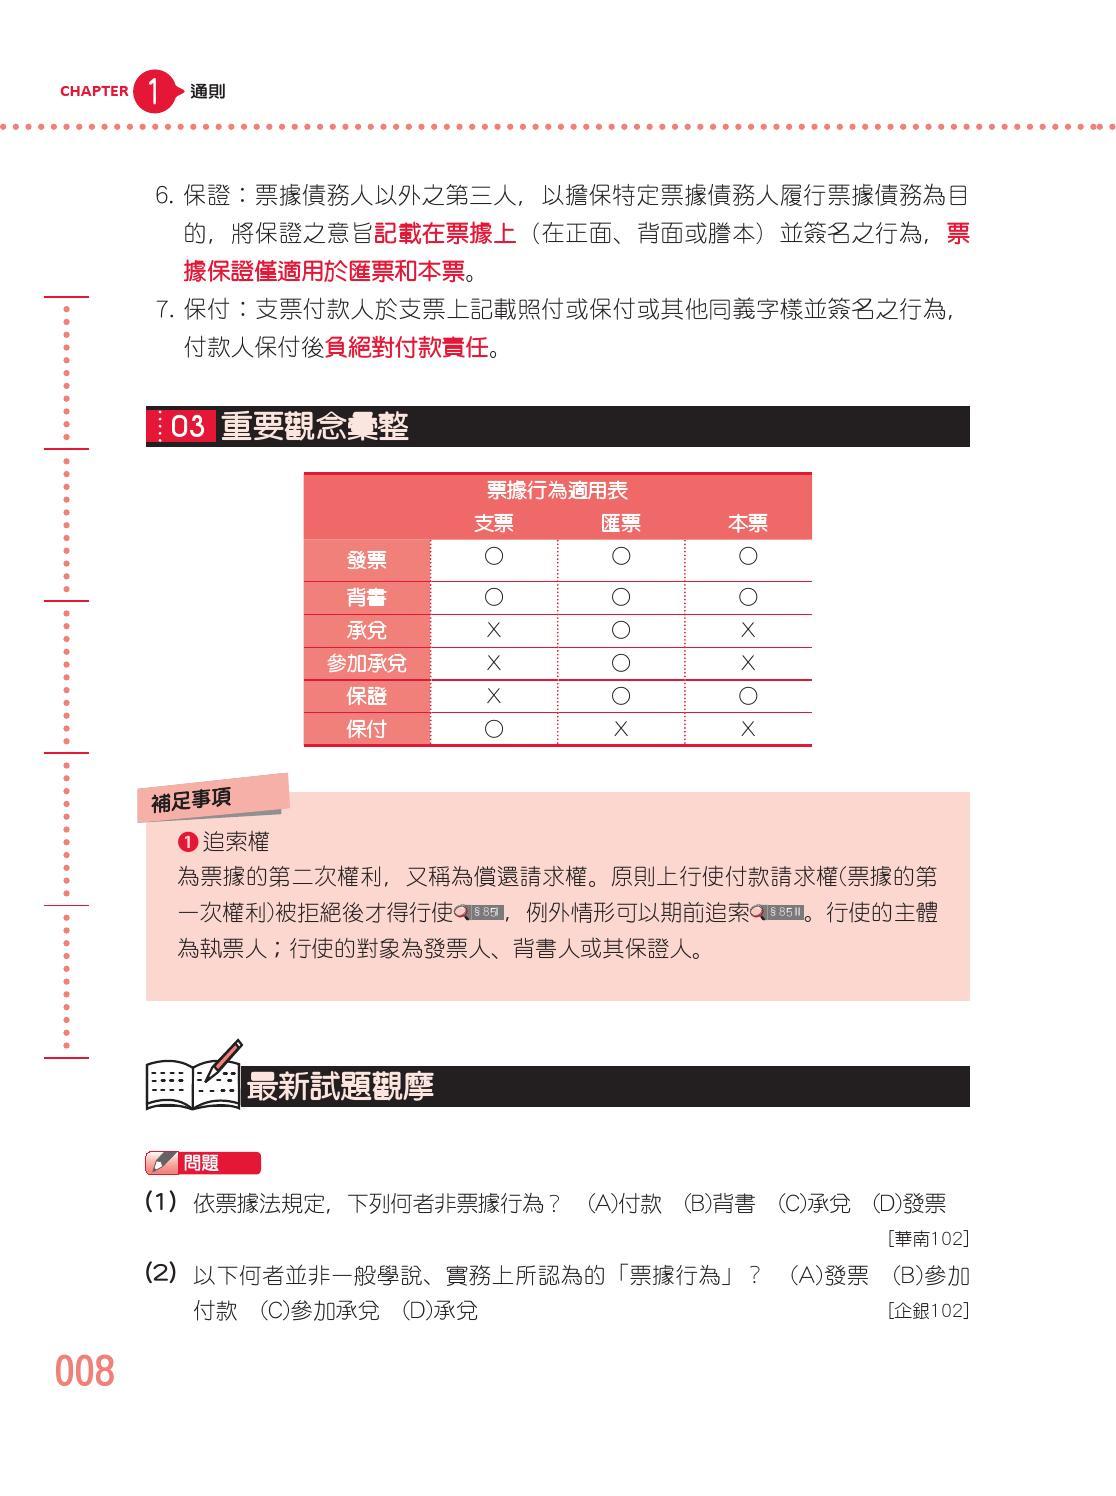 Ce1507 票據法試閱 by greatbooks Lin - Issuu